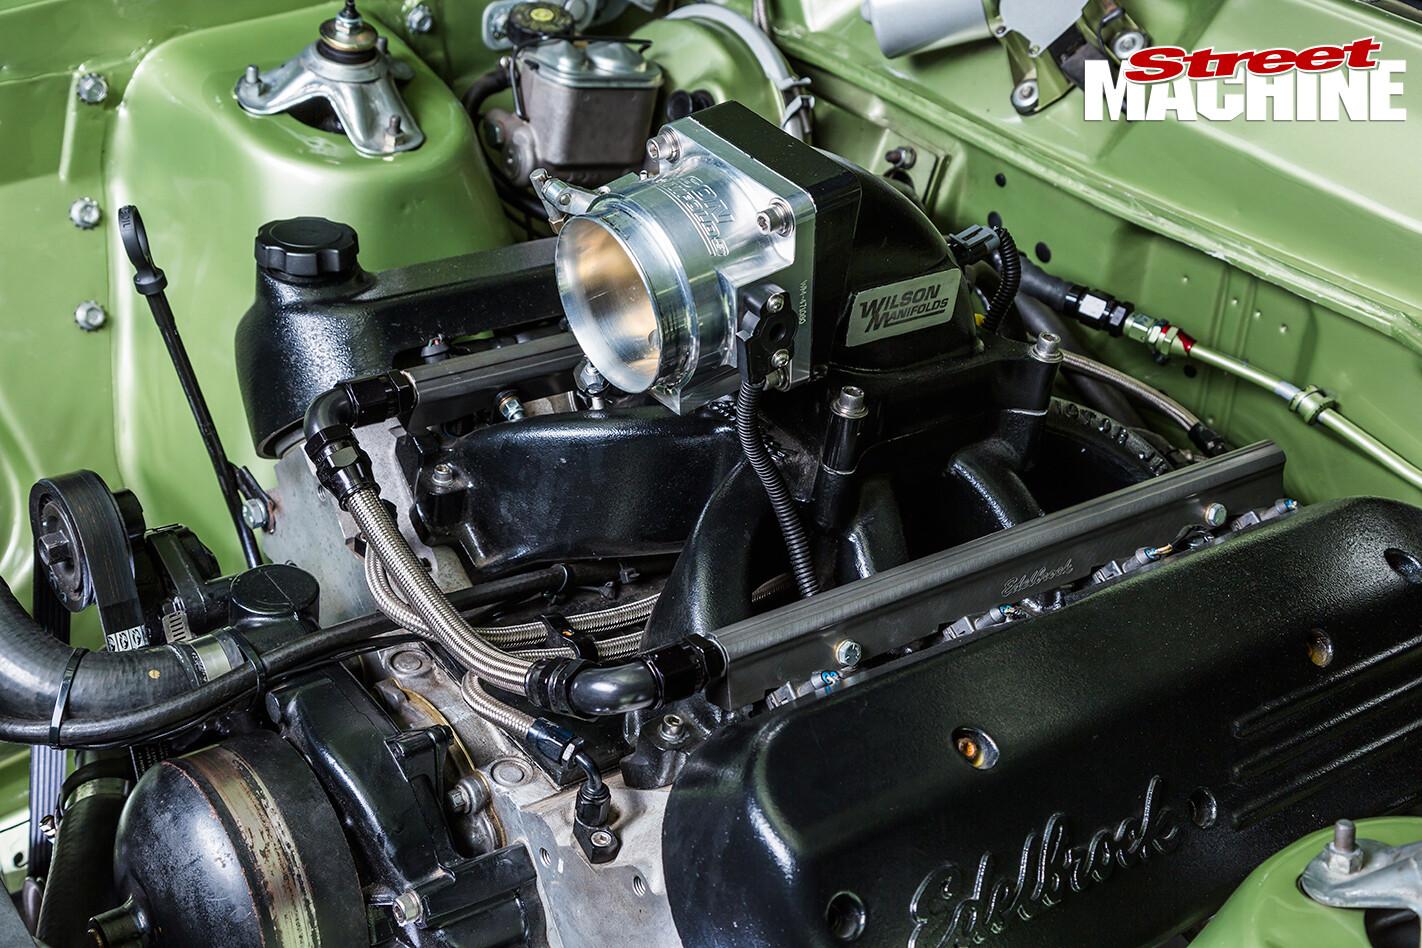 LS1-XW-Ford -Fairmont -GS-3-engine -manifold